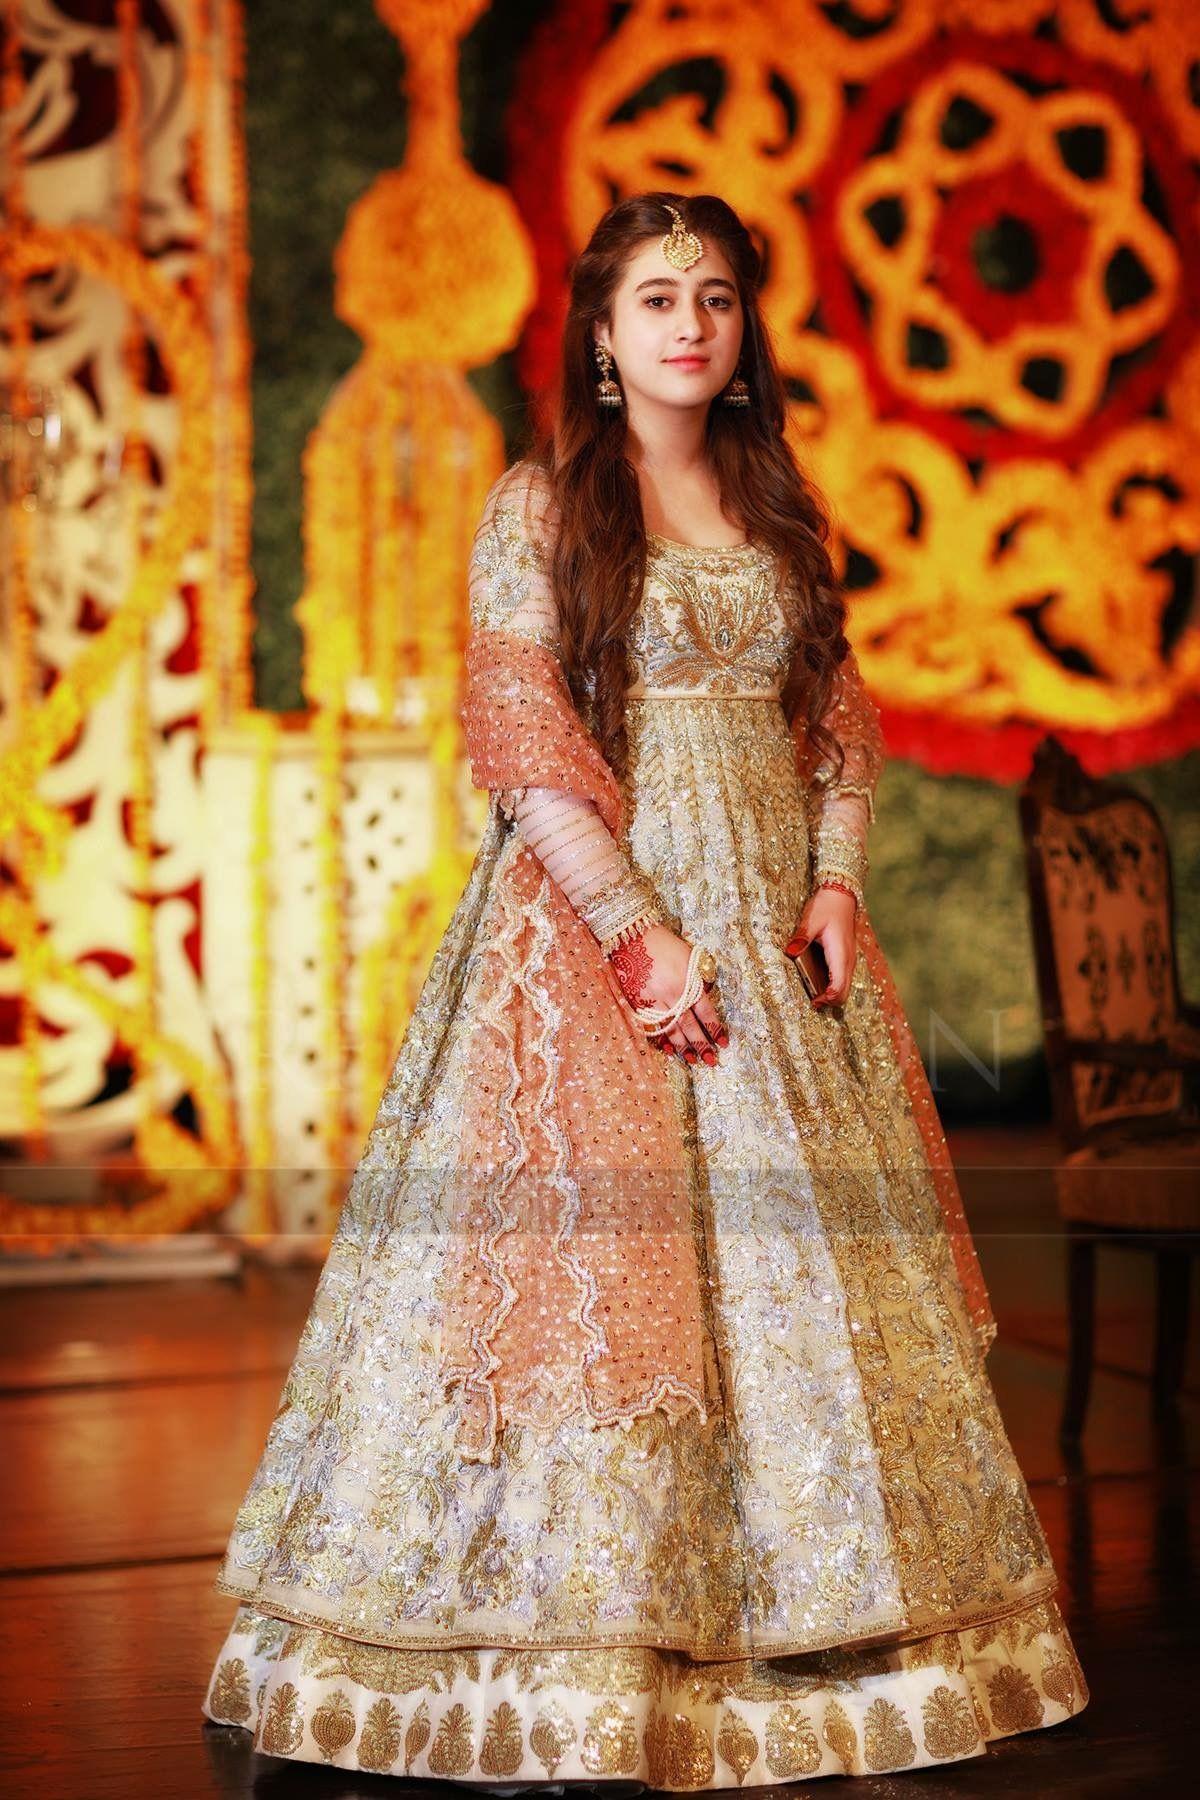 Pin By Iamgk On Wedding Clothes Pakistan Dress Fashion Designers Famous Pakistani Dresses